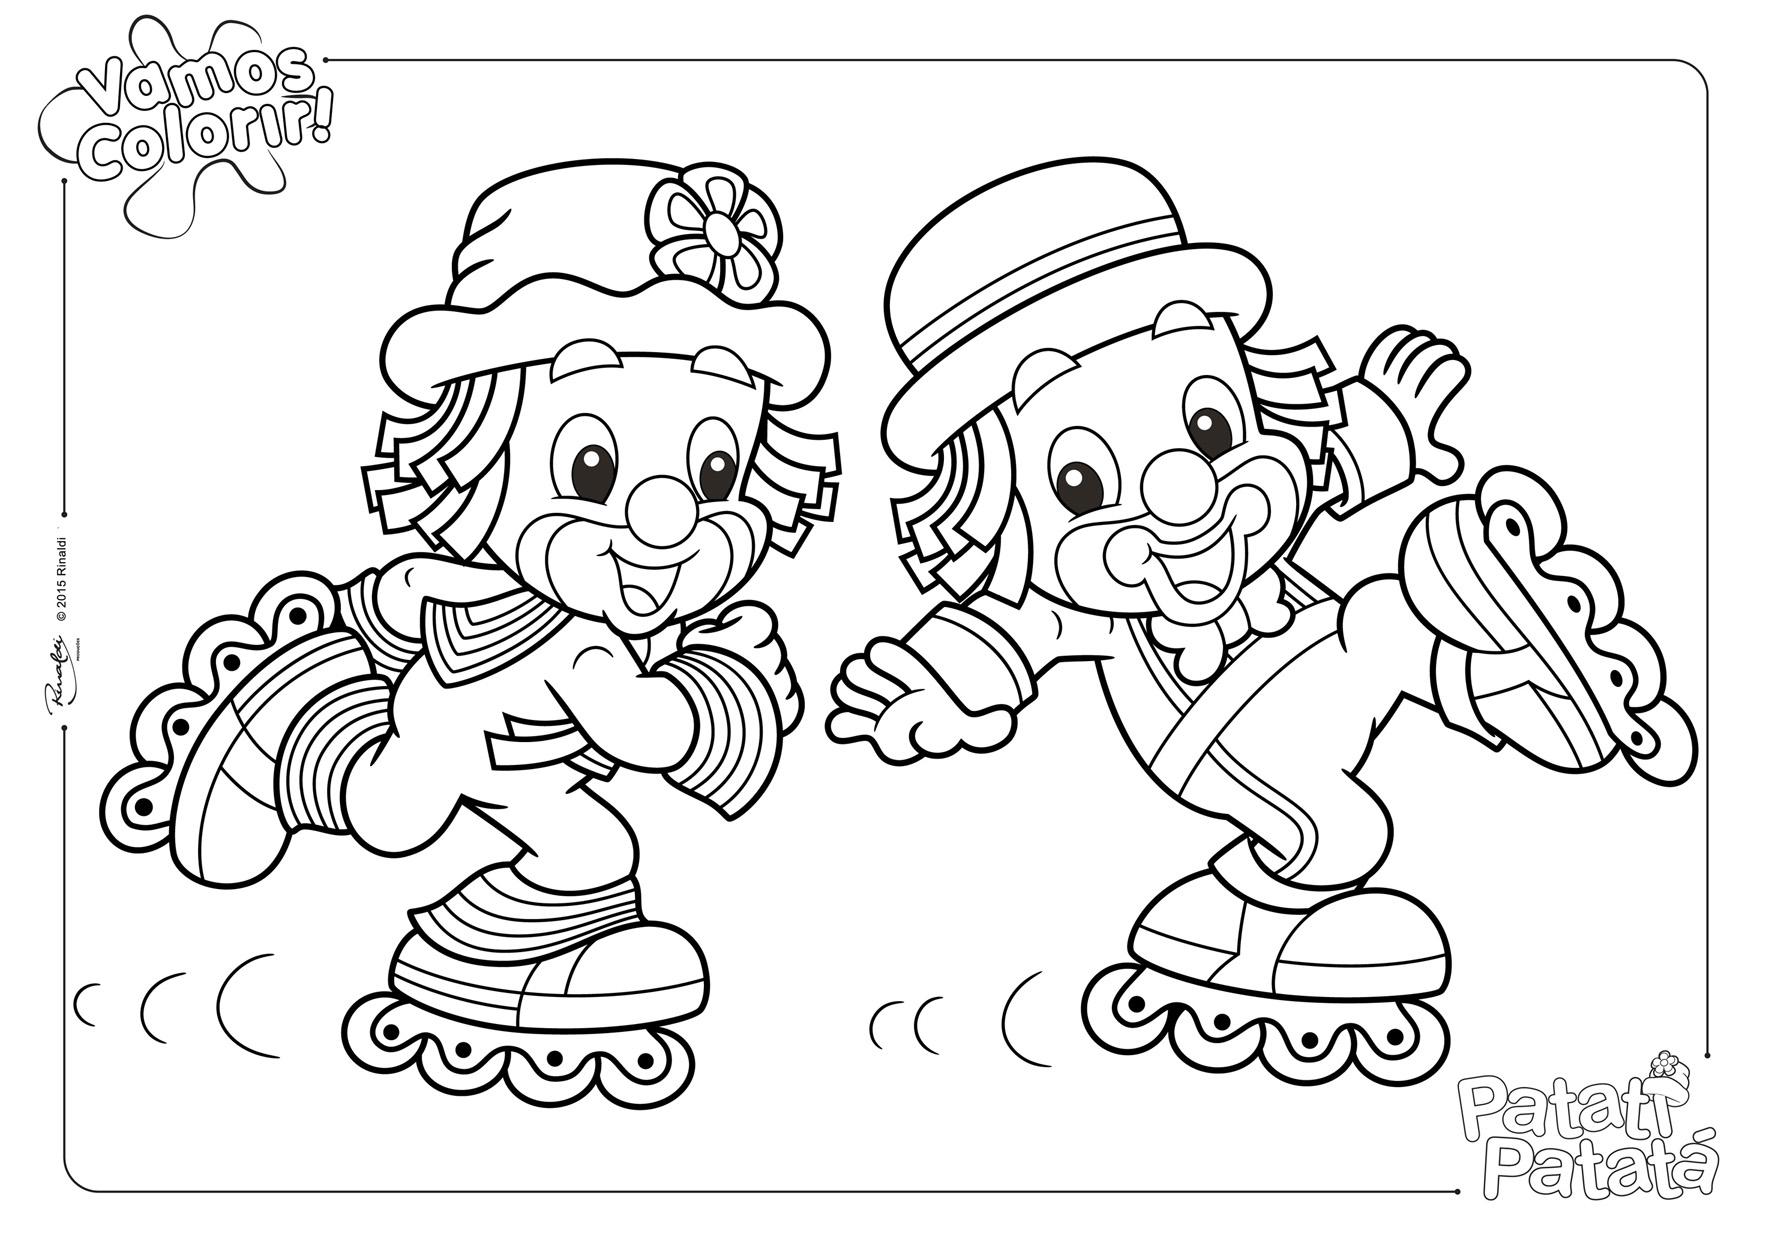 site oficial patati patat225 atividades de colorir